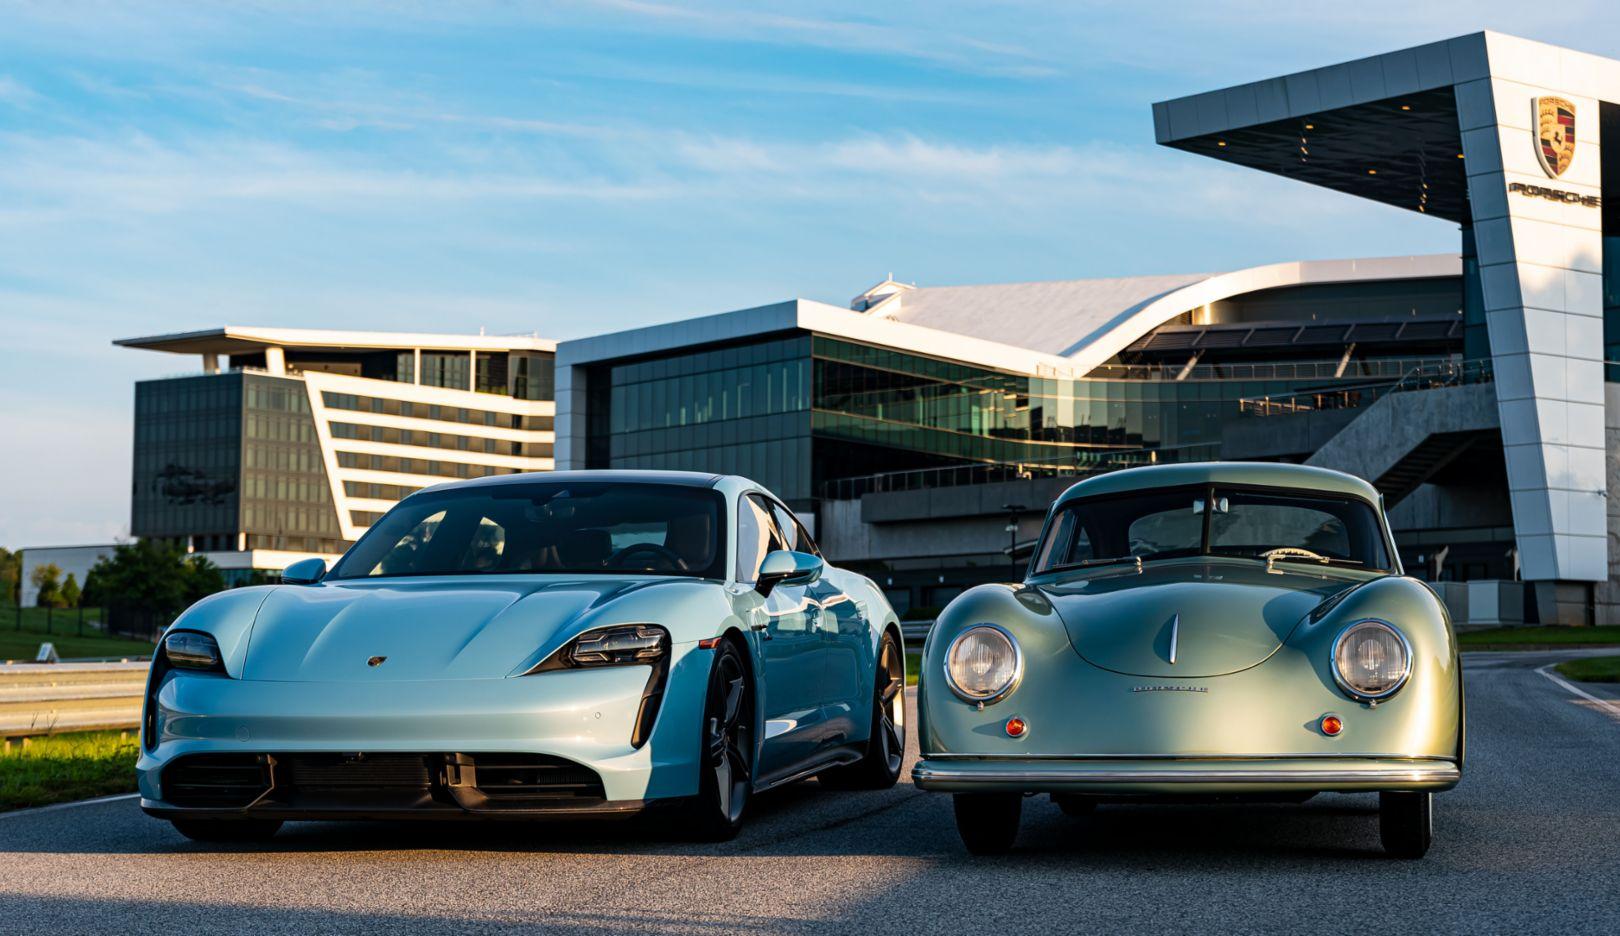 Porsche celebrates 70 years in America - Image 8